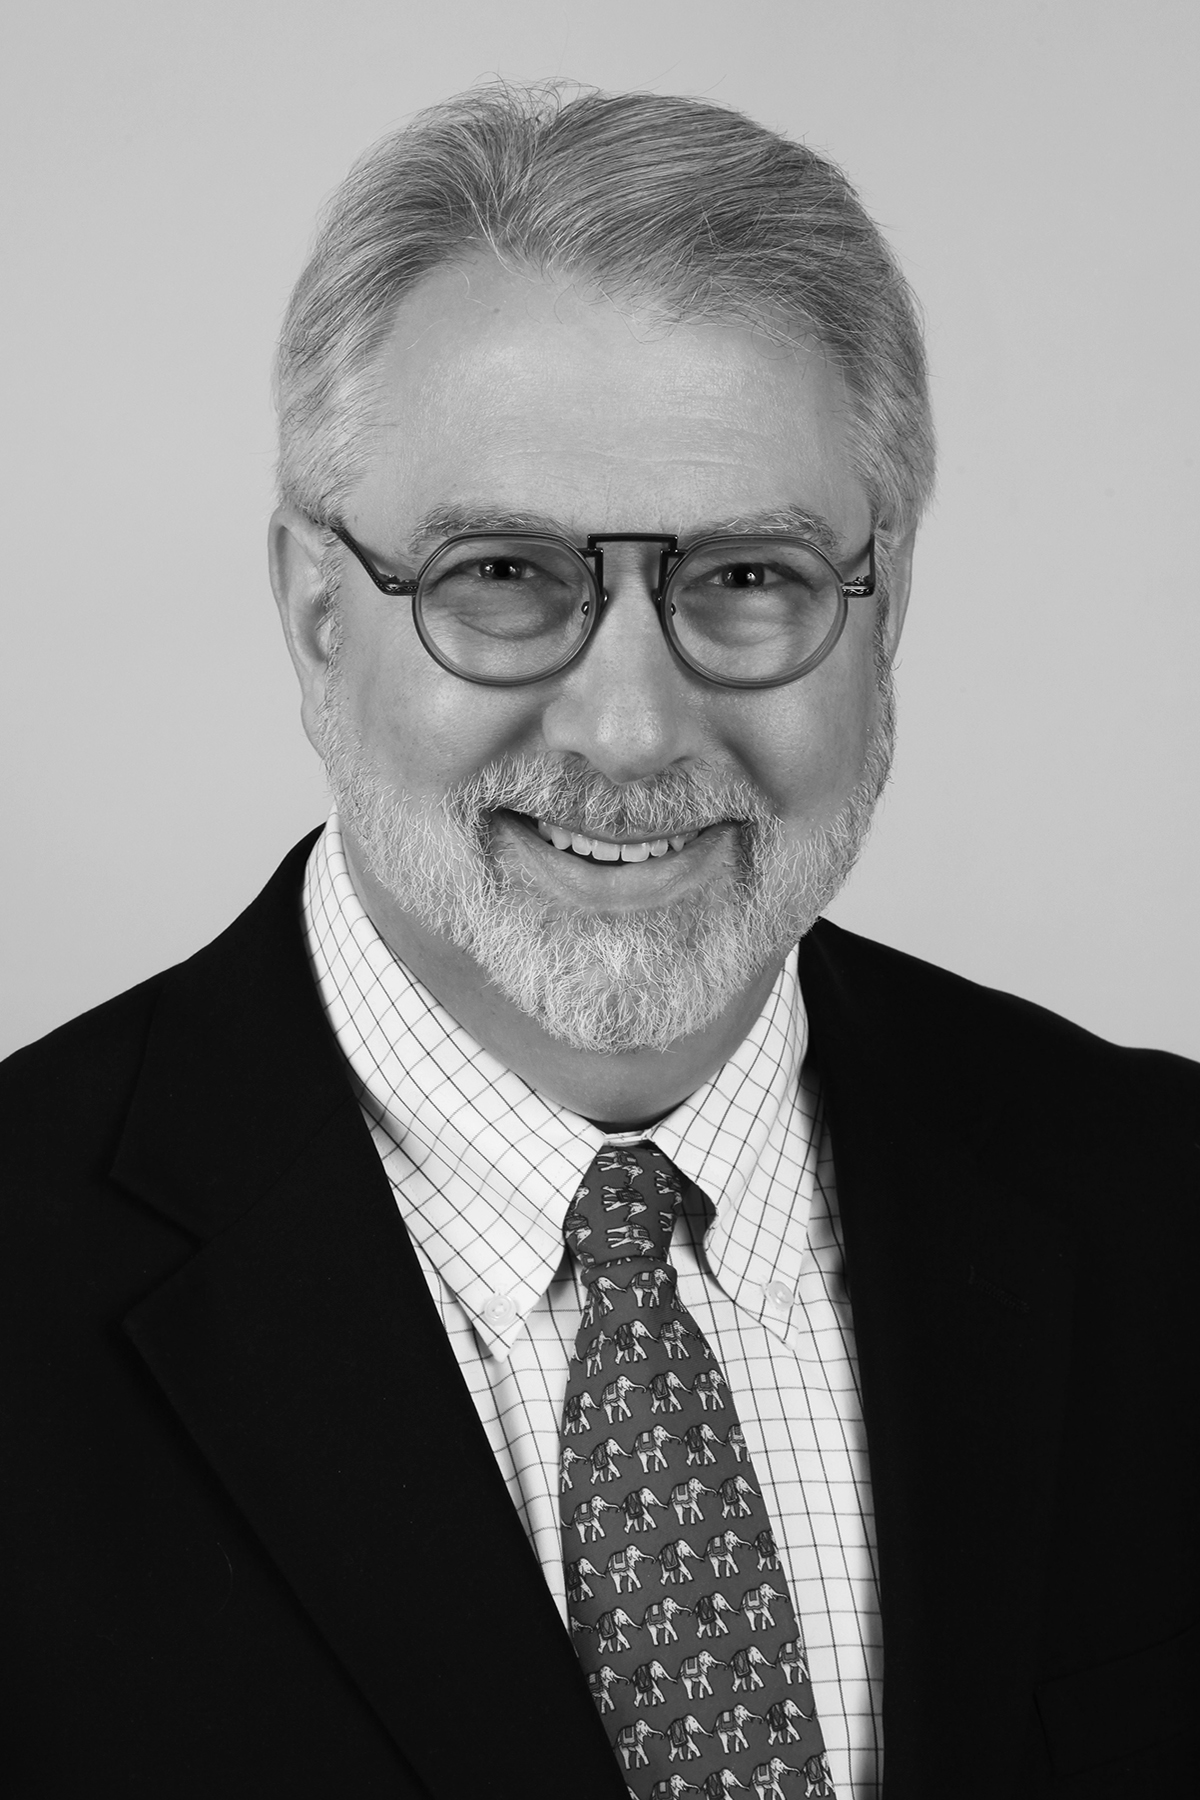 David M Schure